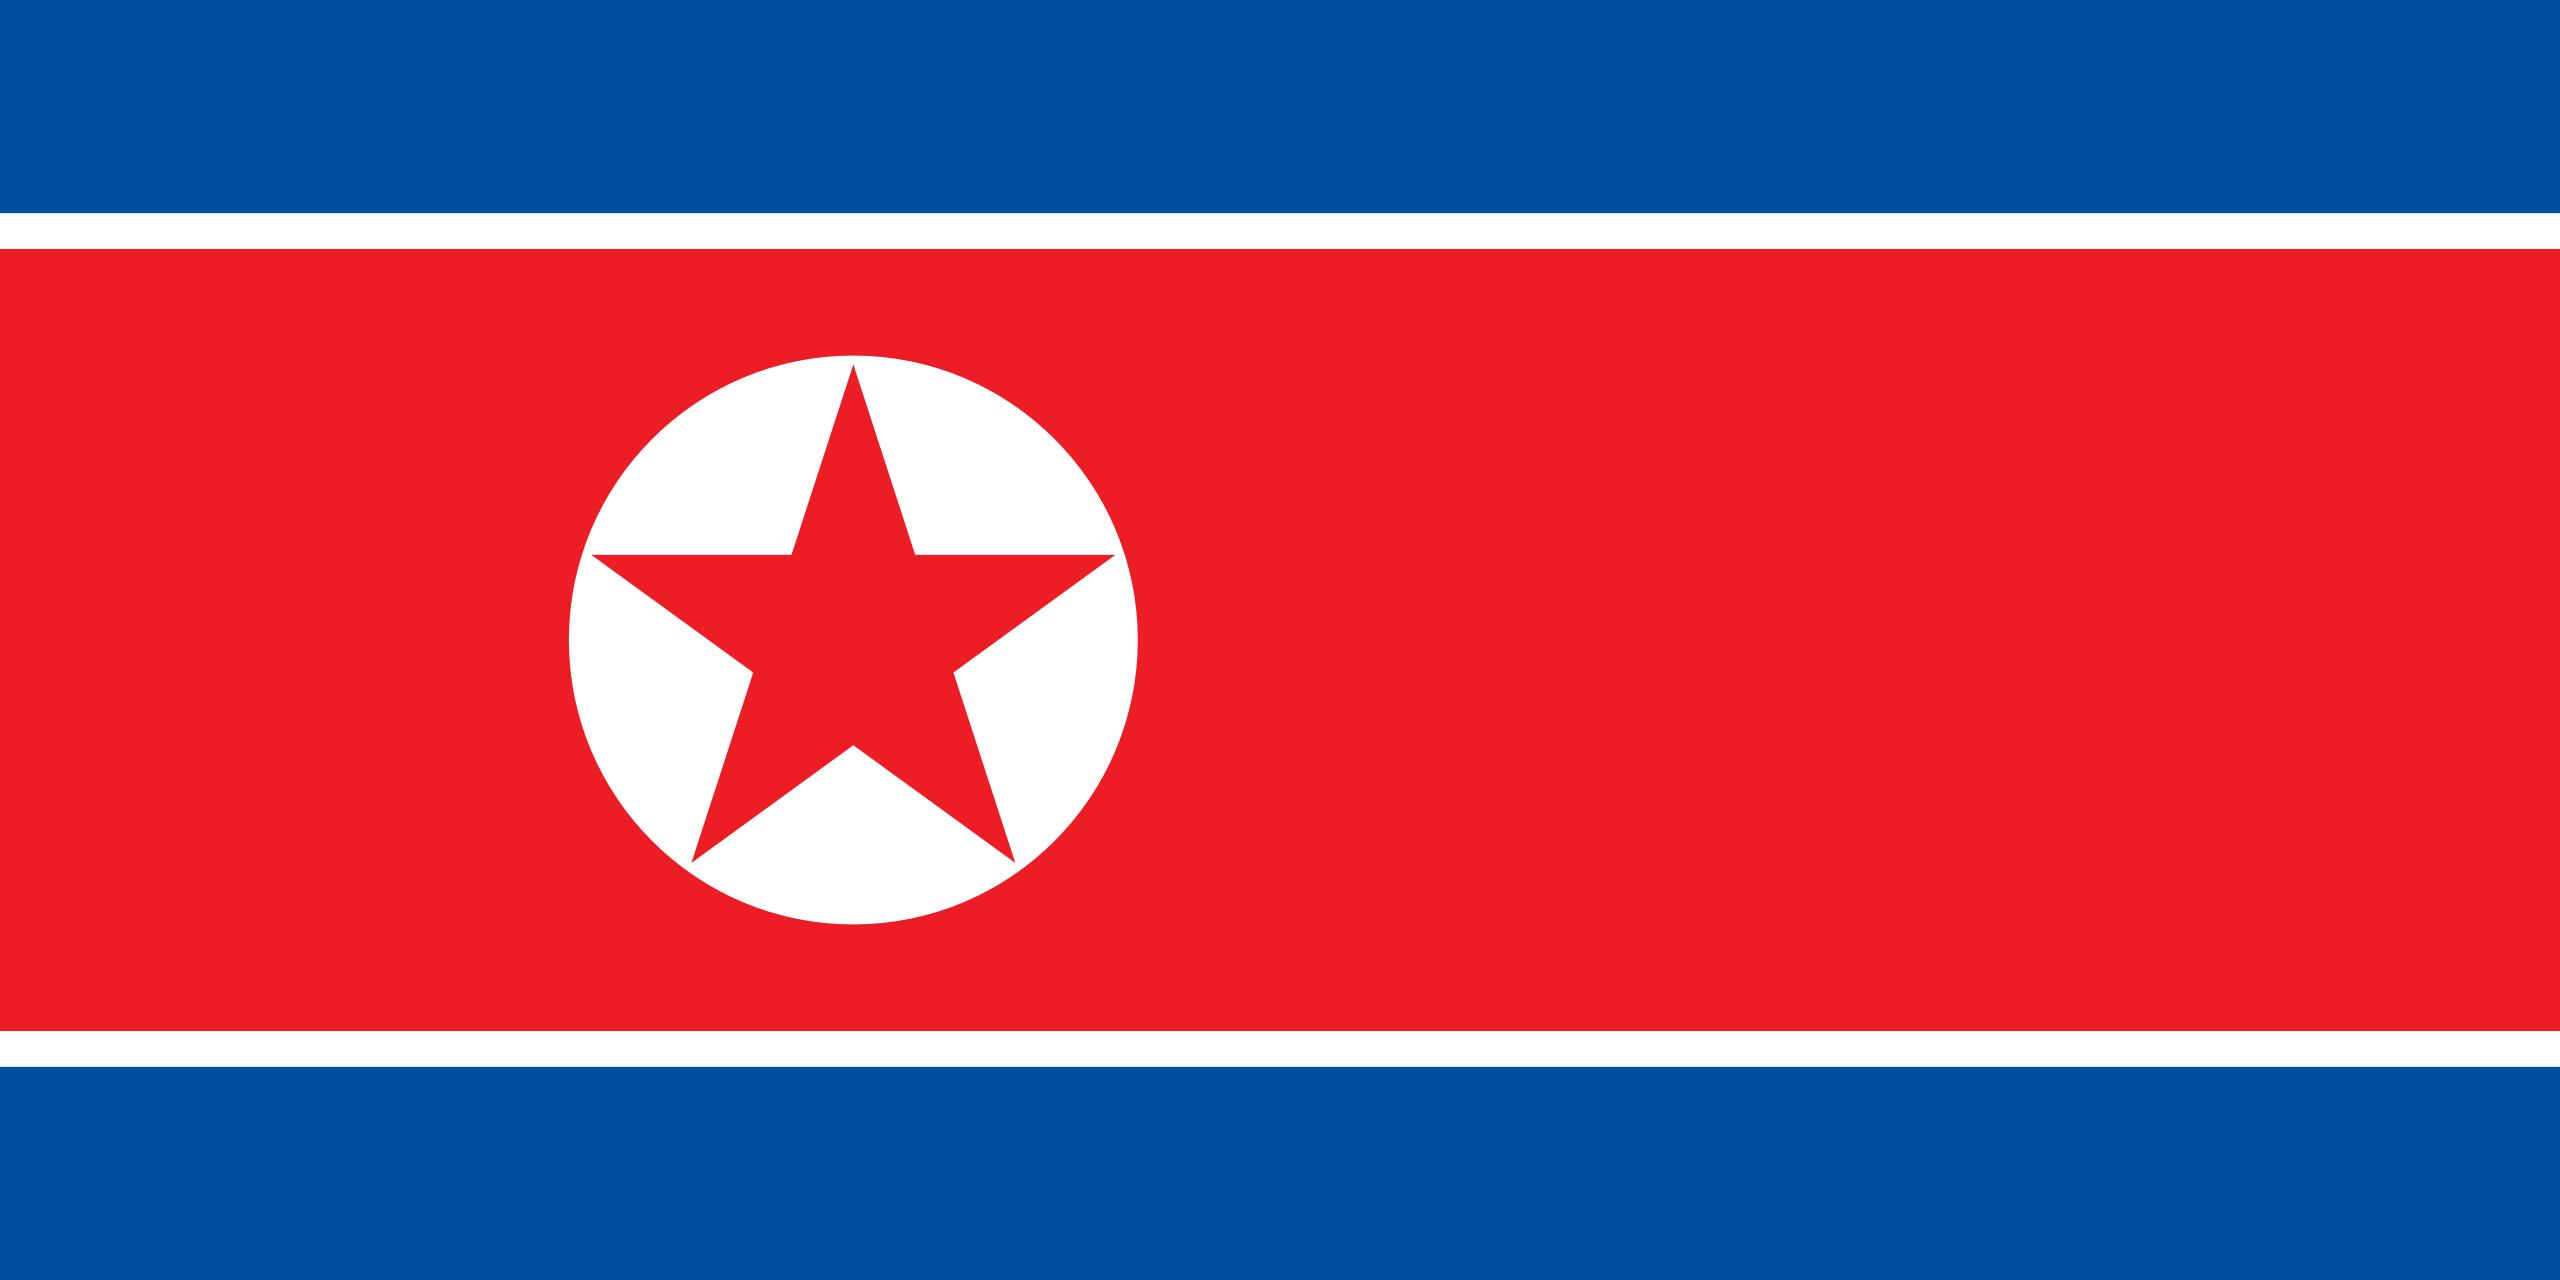 corea del norte, país, Brasão de armas, logotipo, símbolo - Papéis de parede HD - Professor-falken.com